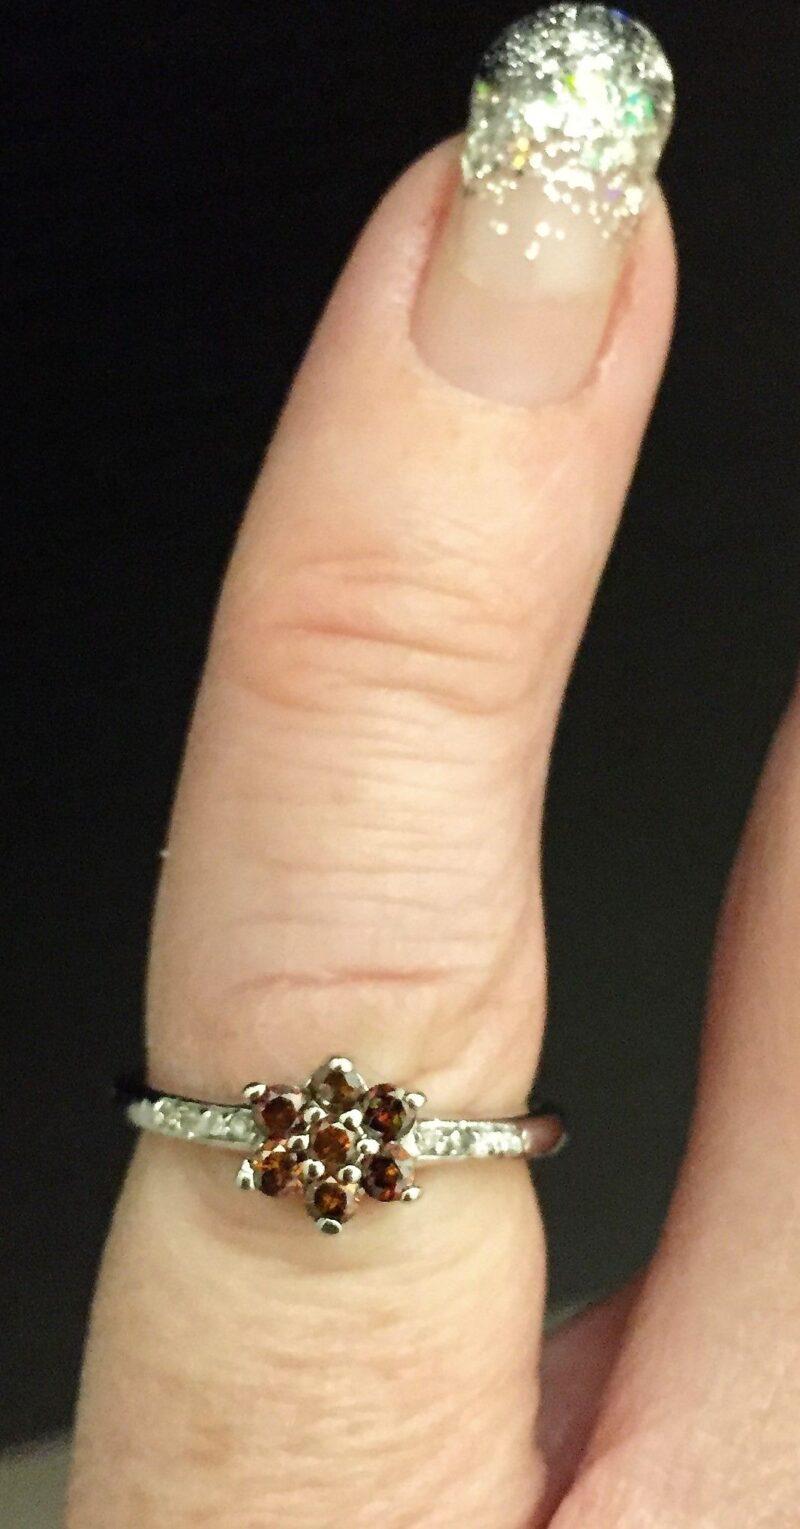 Cognac Farvet Roset Ring i 14 Karat Hvidguld.